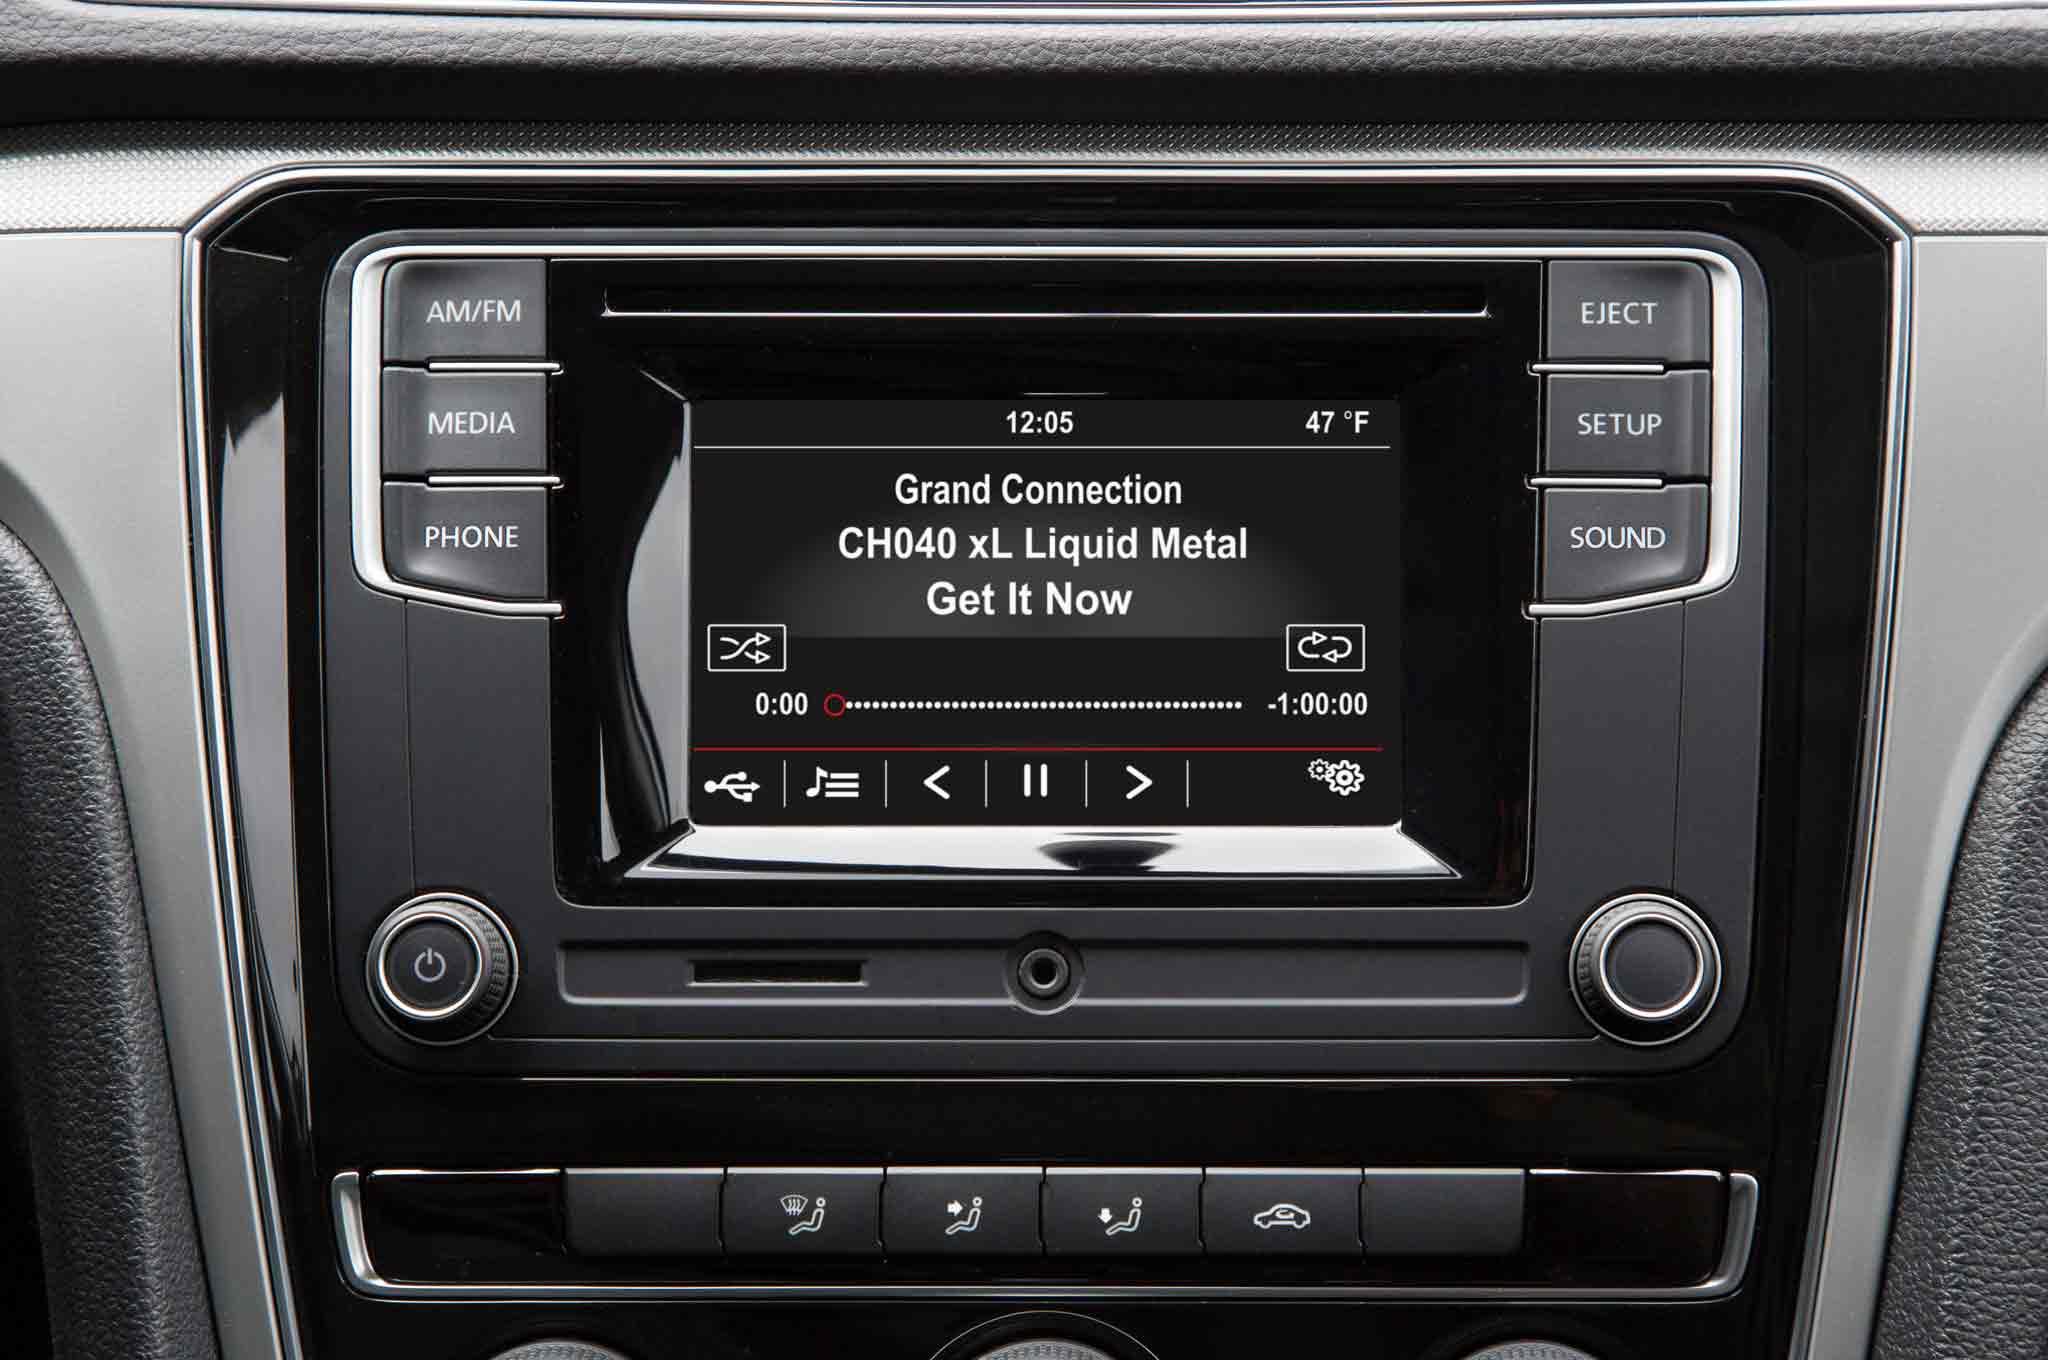 Volkswagen Gsr Radio Display Sat Radio